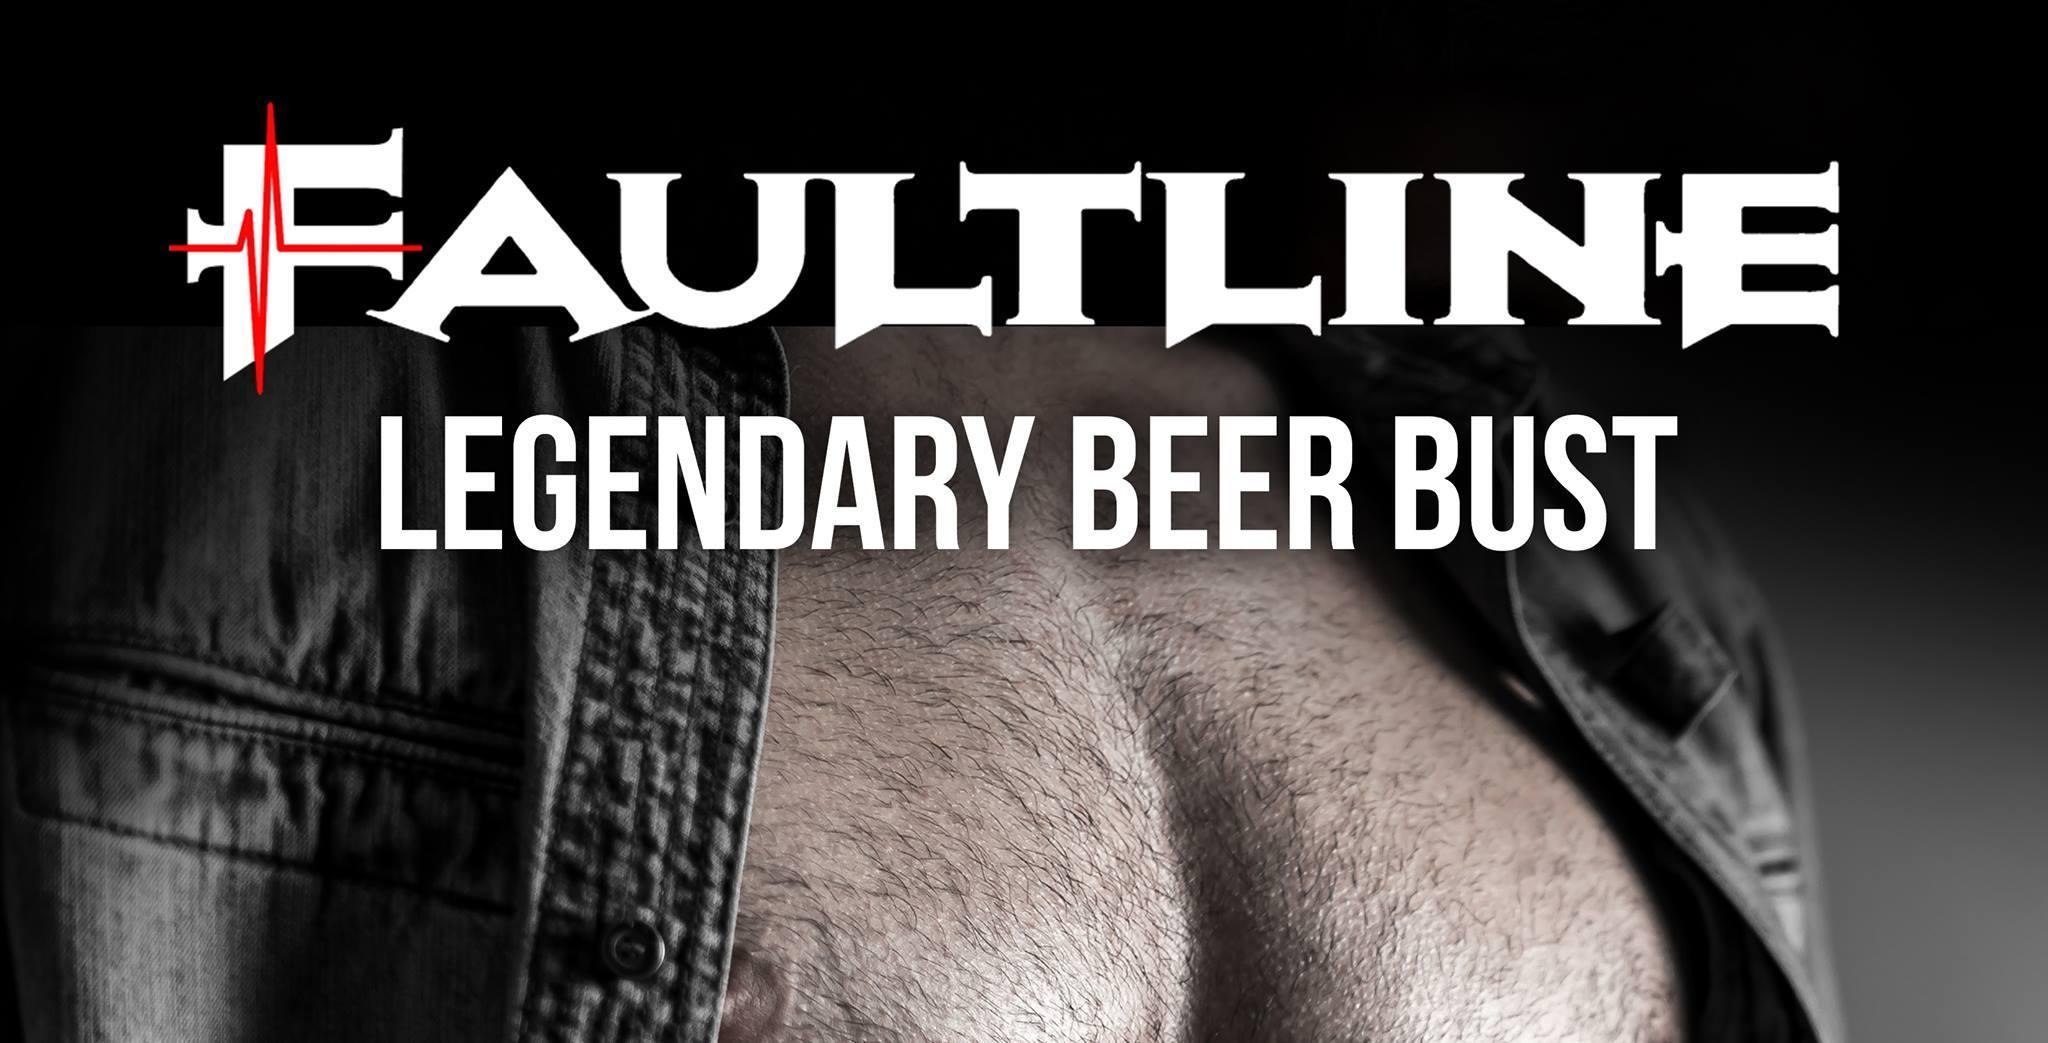 Legendary Sunday Beer Bust at Faultline